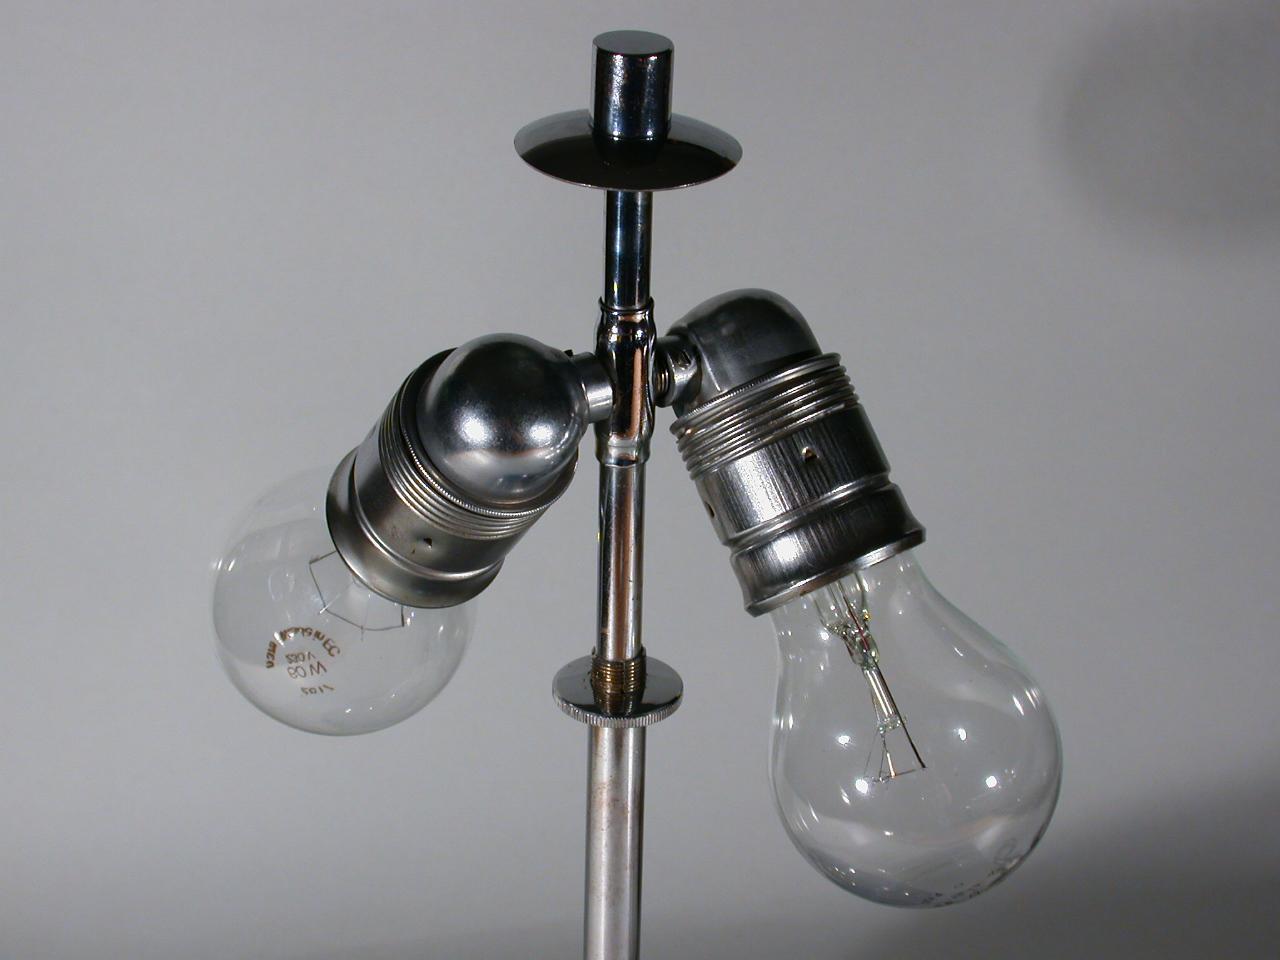 Wmf ikora art deco lampe les styles modernes for Art deco lampe